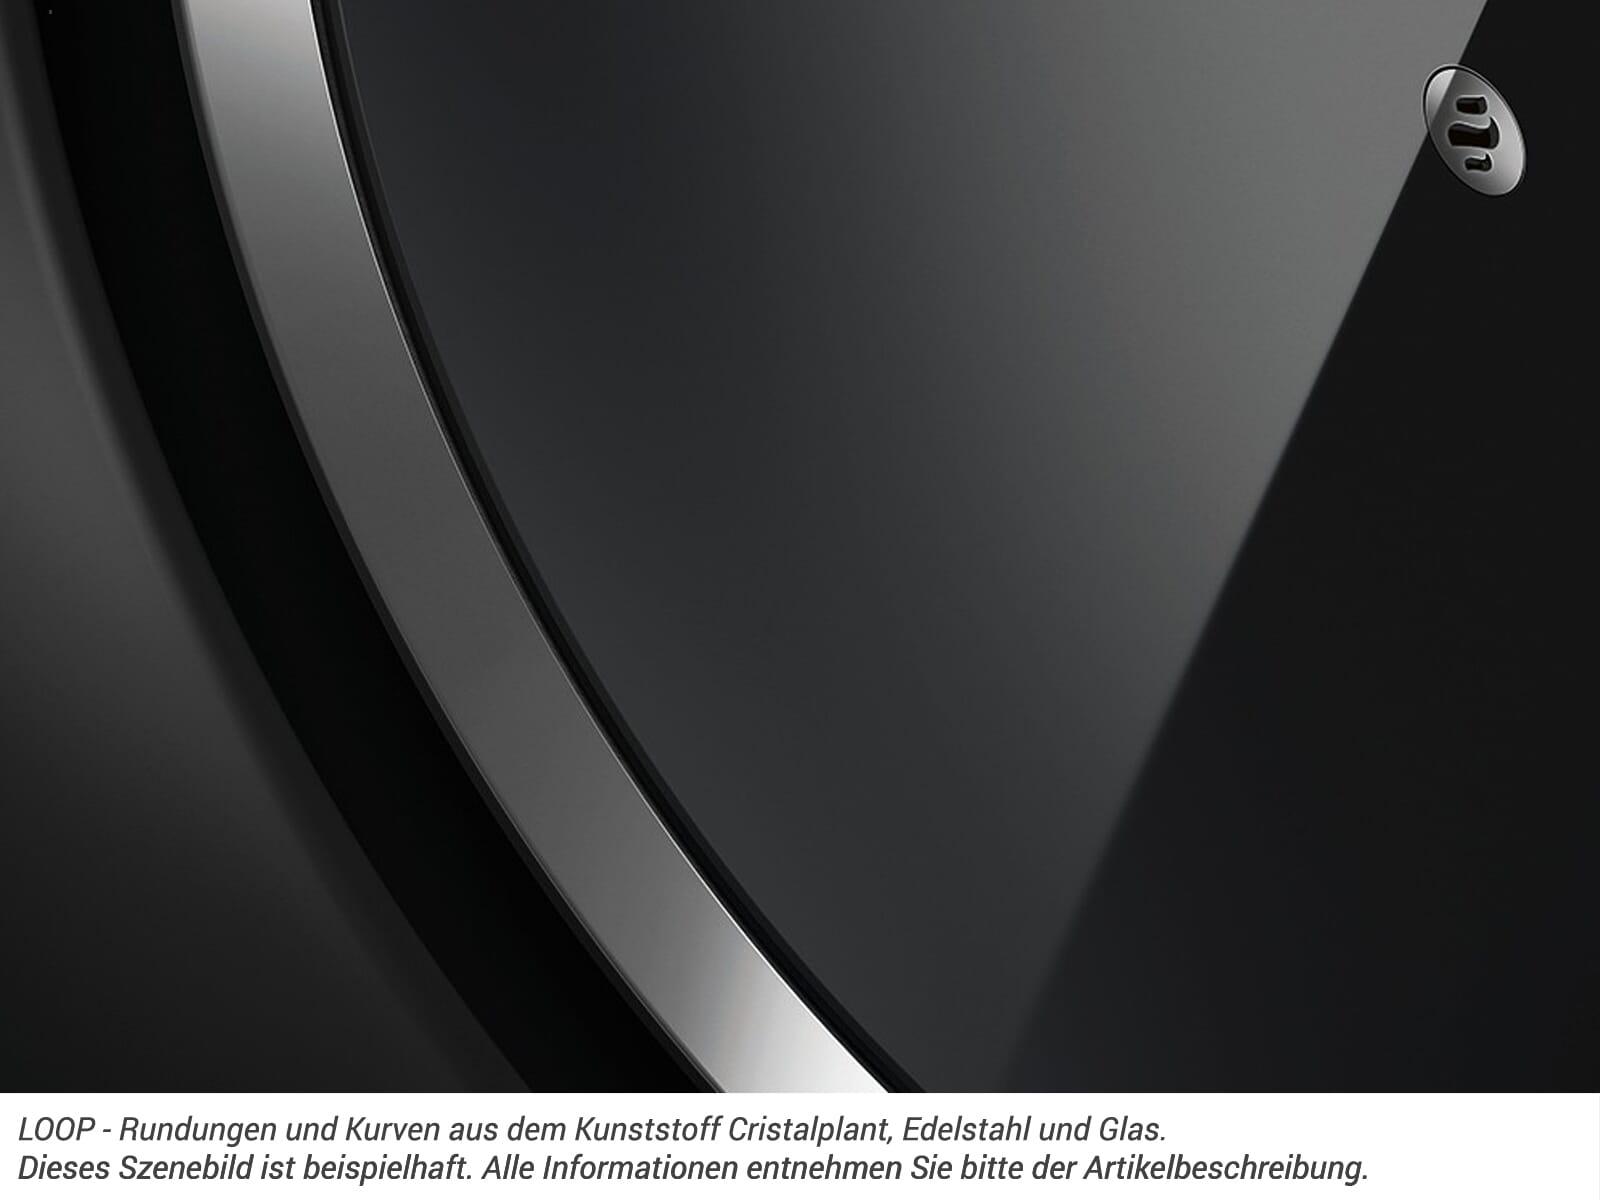 Elica Loop PRF0147269 Kopffreihaube Schwarz